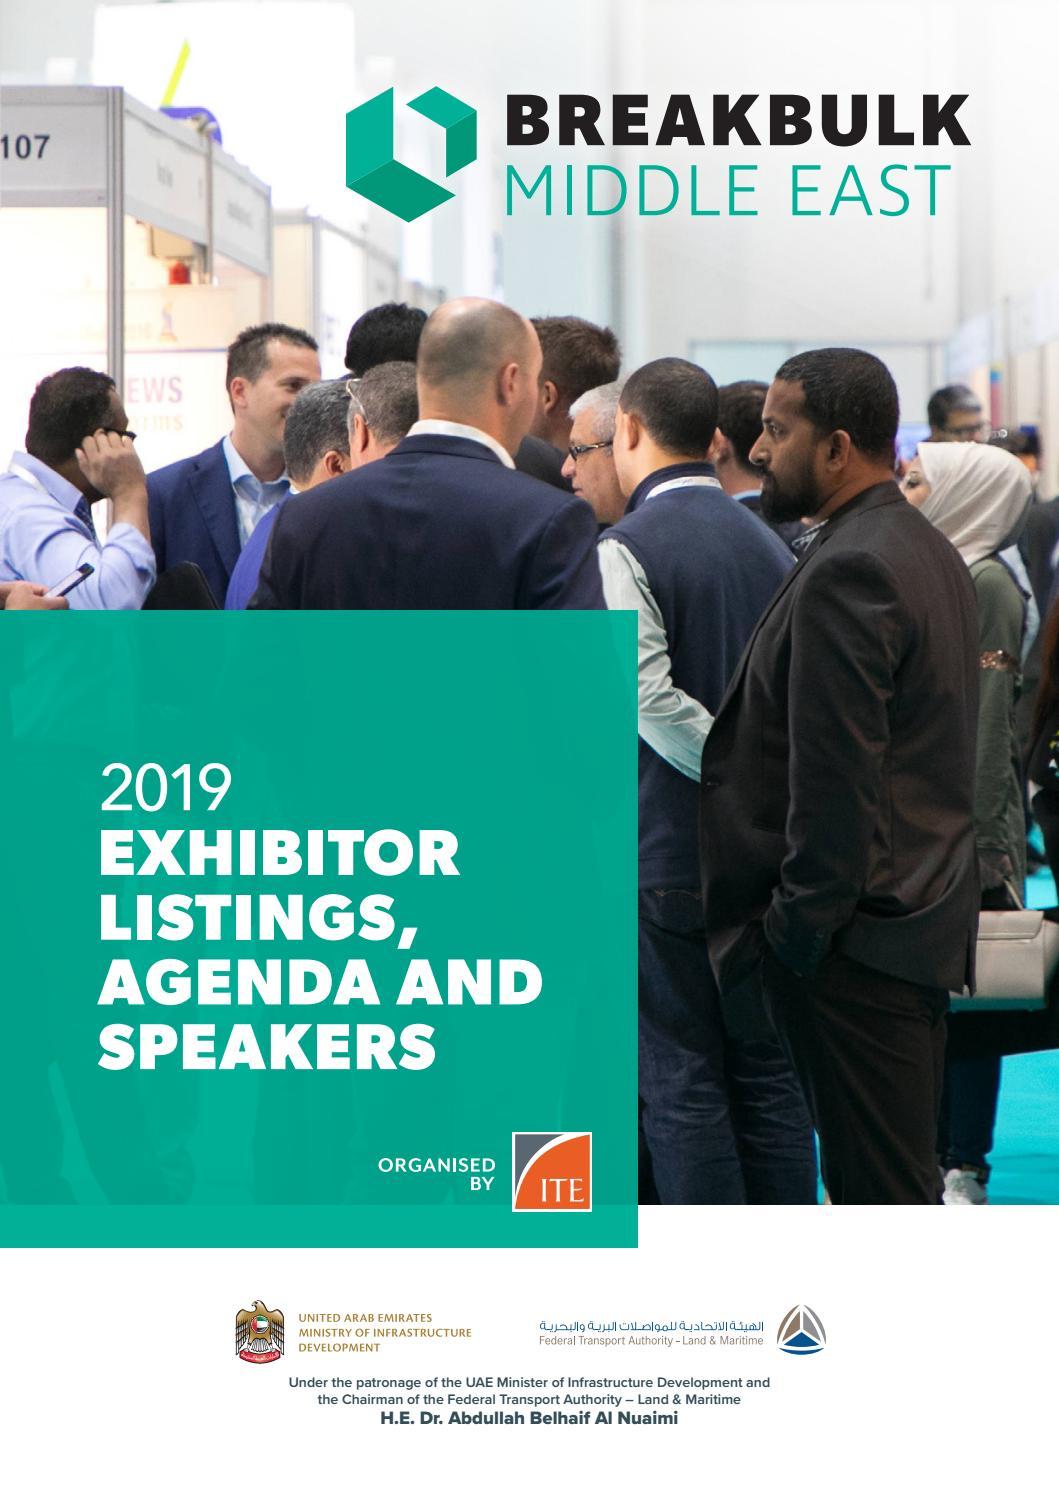 Breakbulk Middle East 2019 Exhibitor Listings, Agenda and